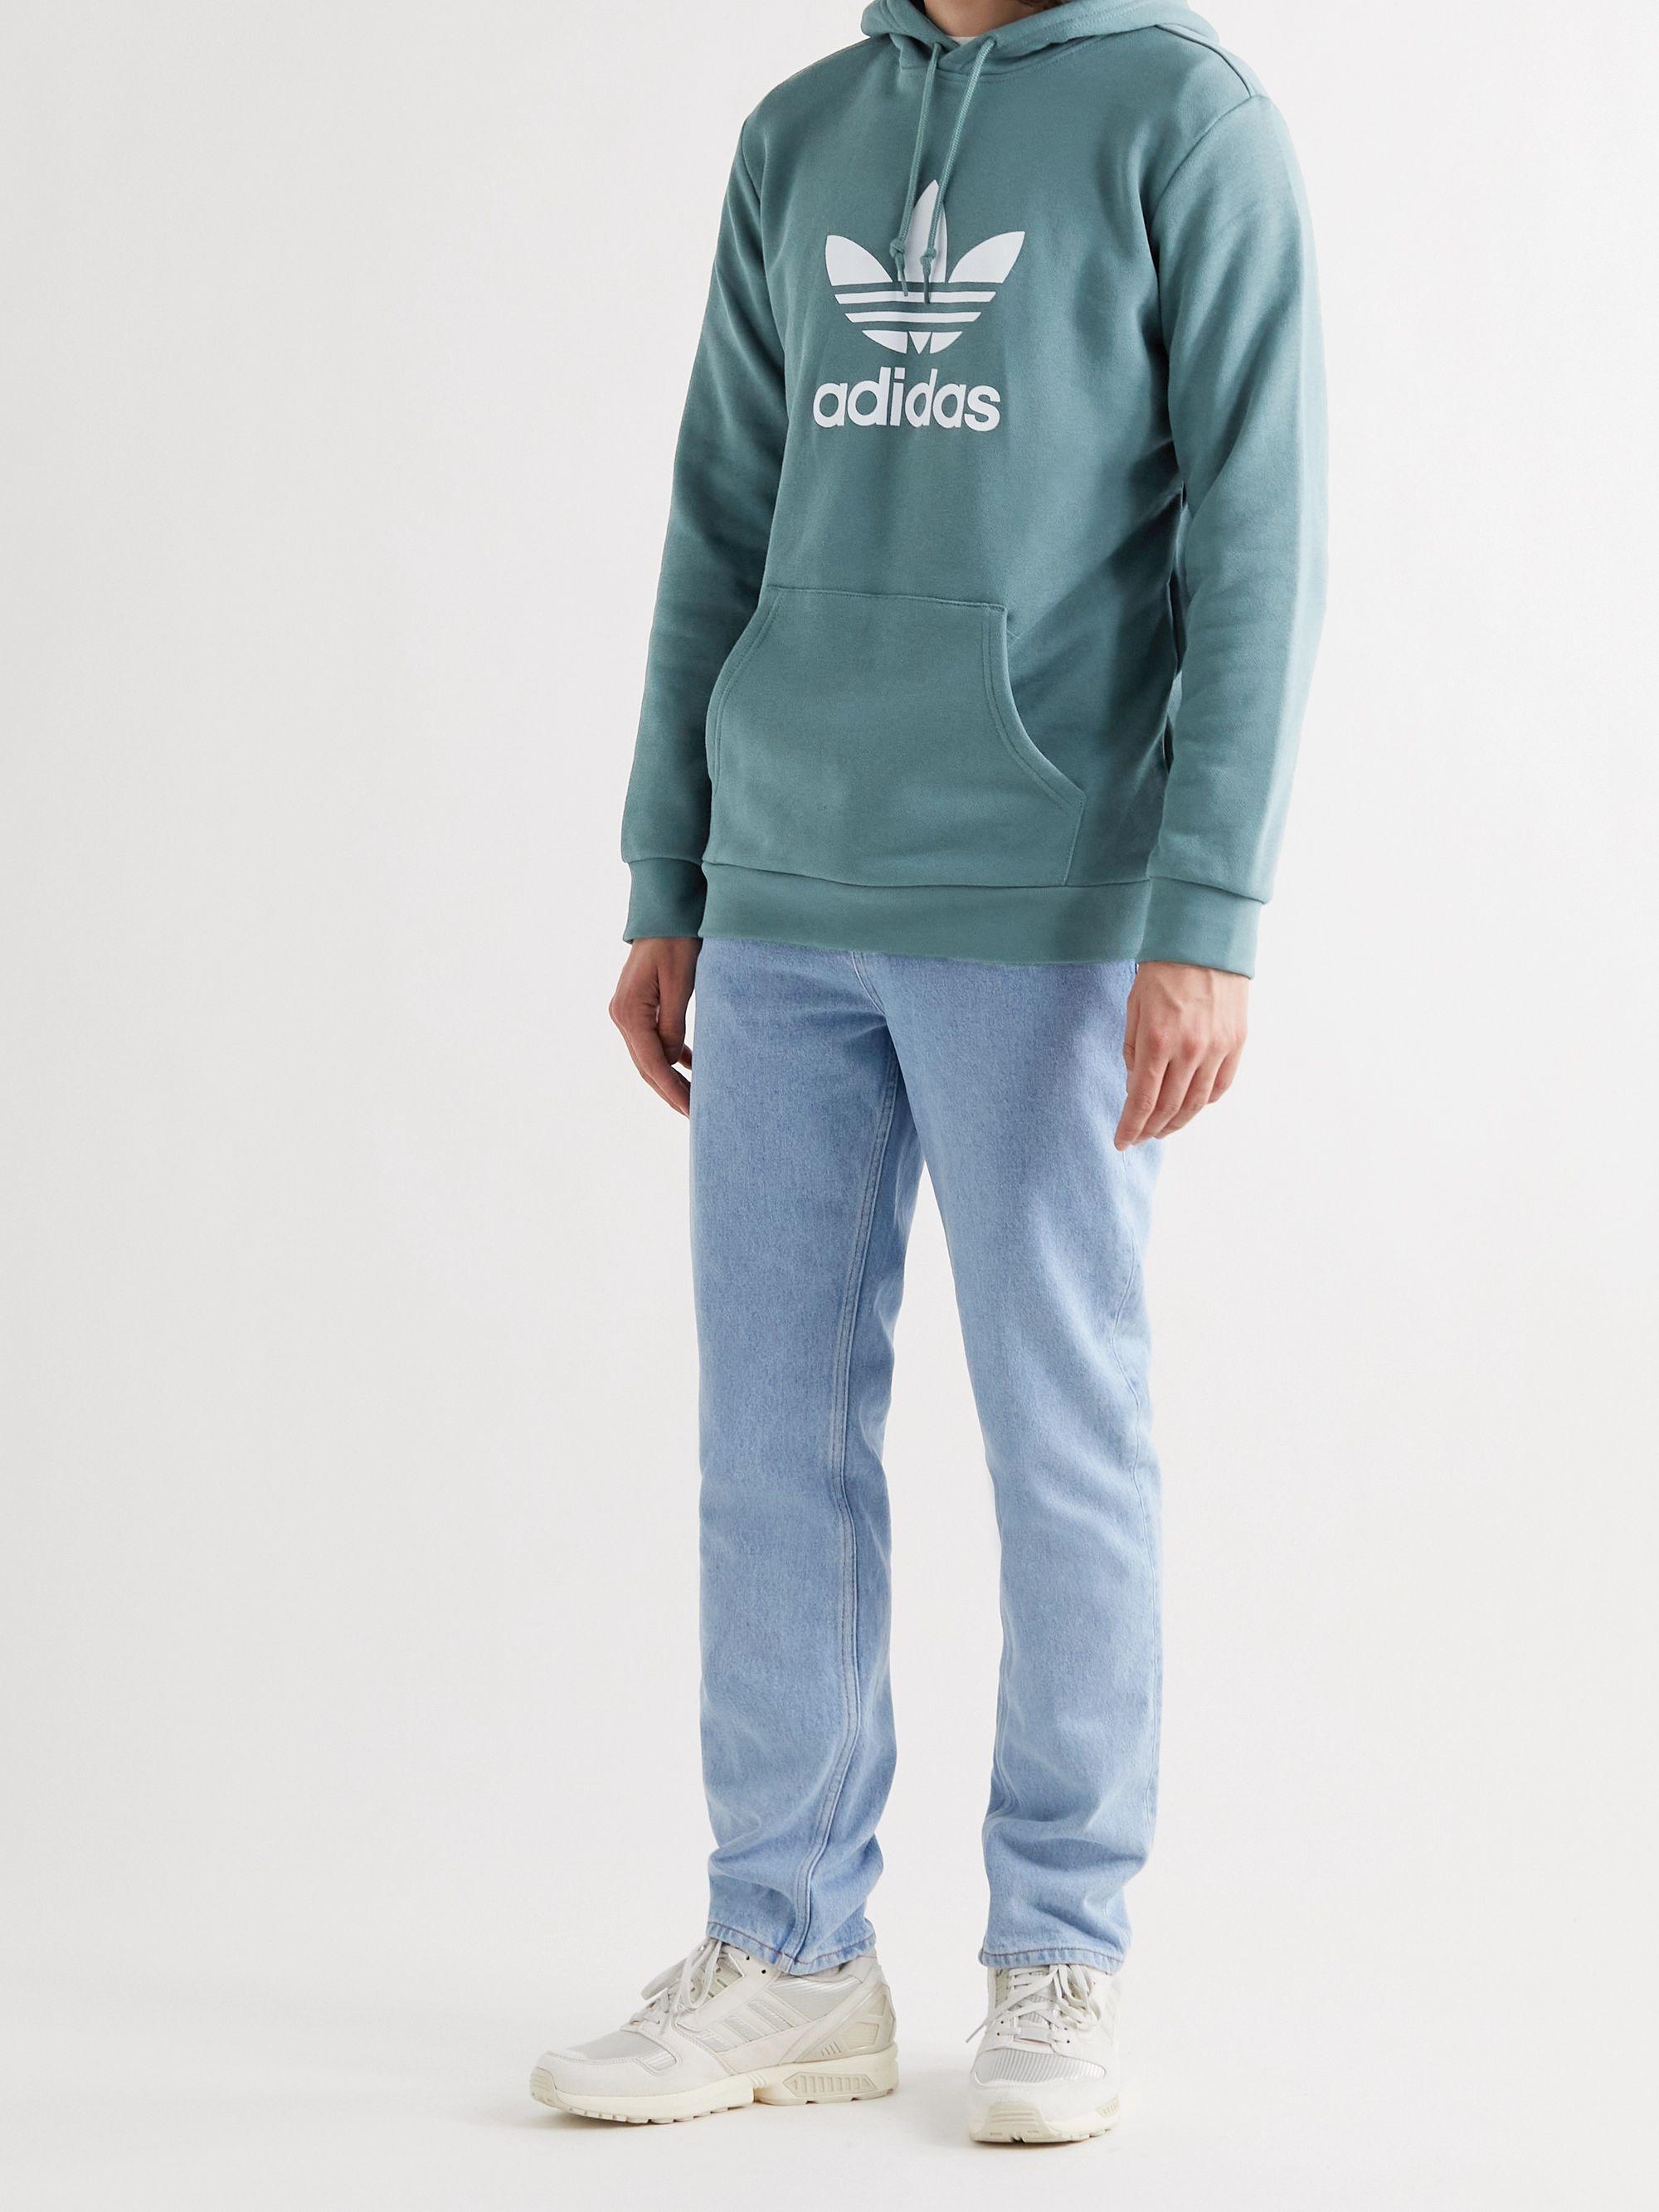 Green Logo-Print Cotton-Jersey Hoodie   ADIDAS ORIGINALS   MR PORTER